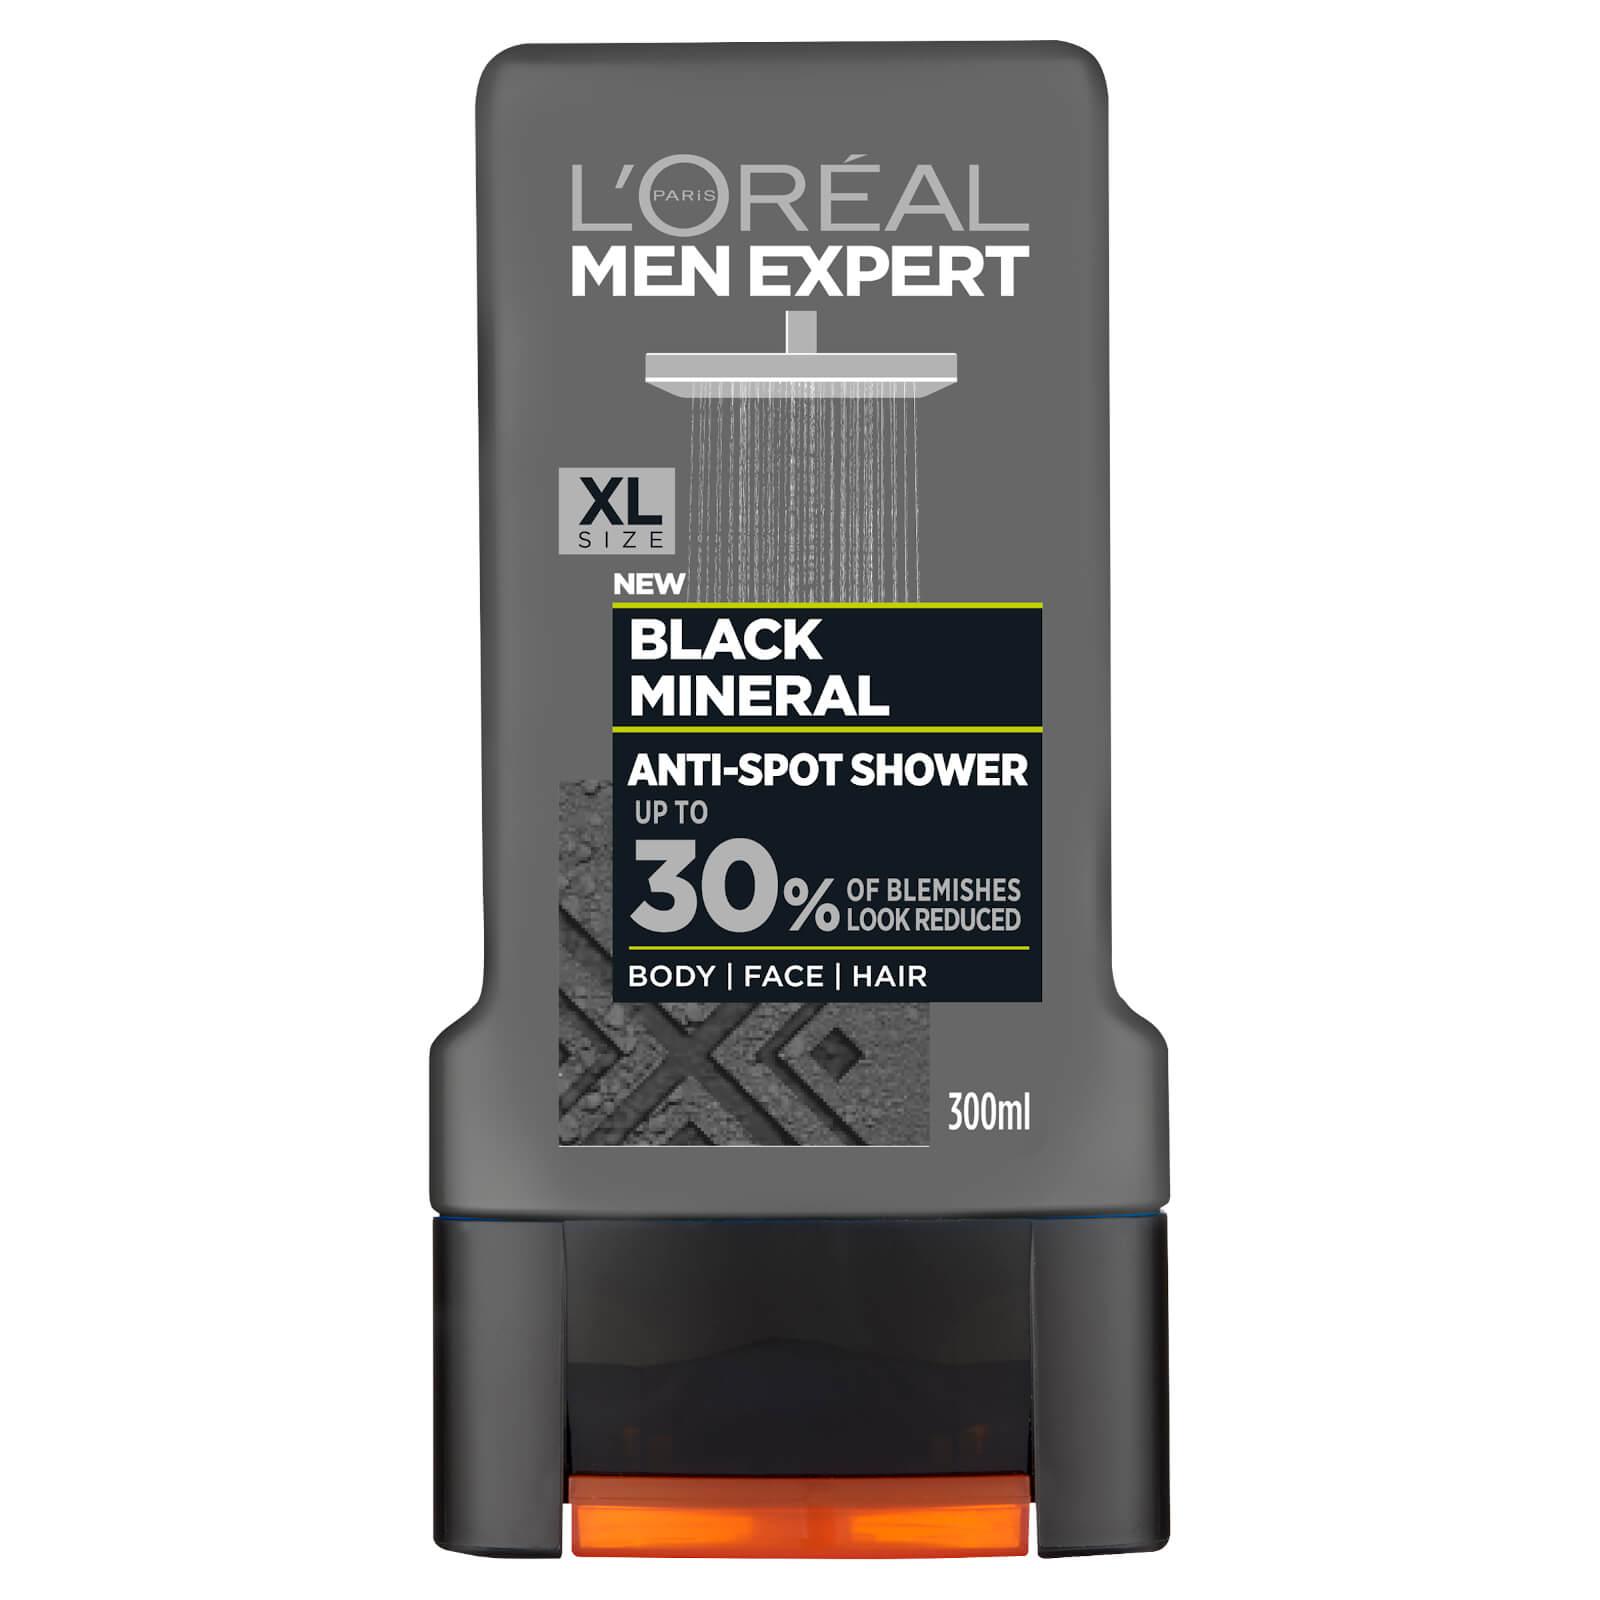 Купить L'Oréal Paris Men Expert Black Mineral Anti-Spot Shower Gel 300ml